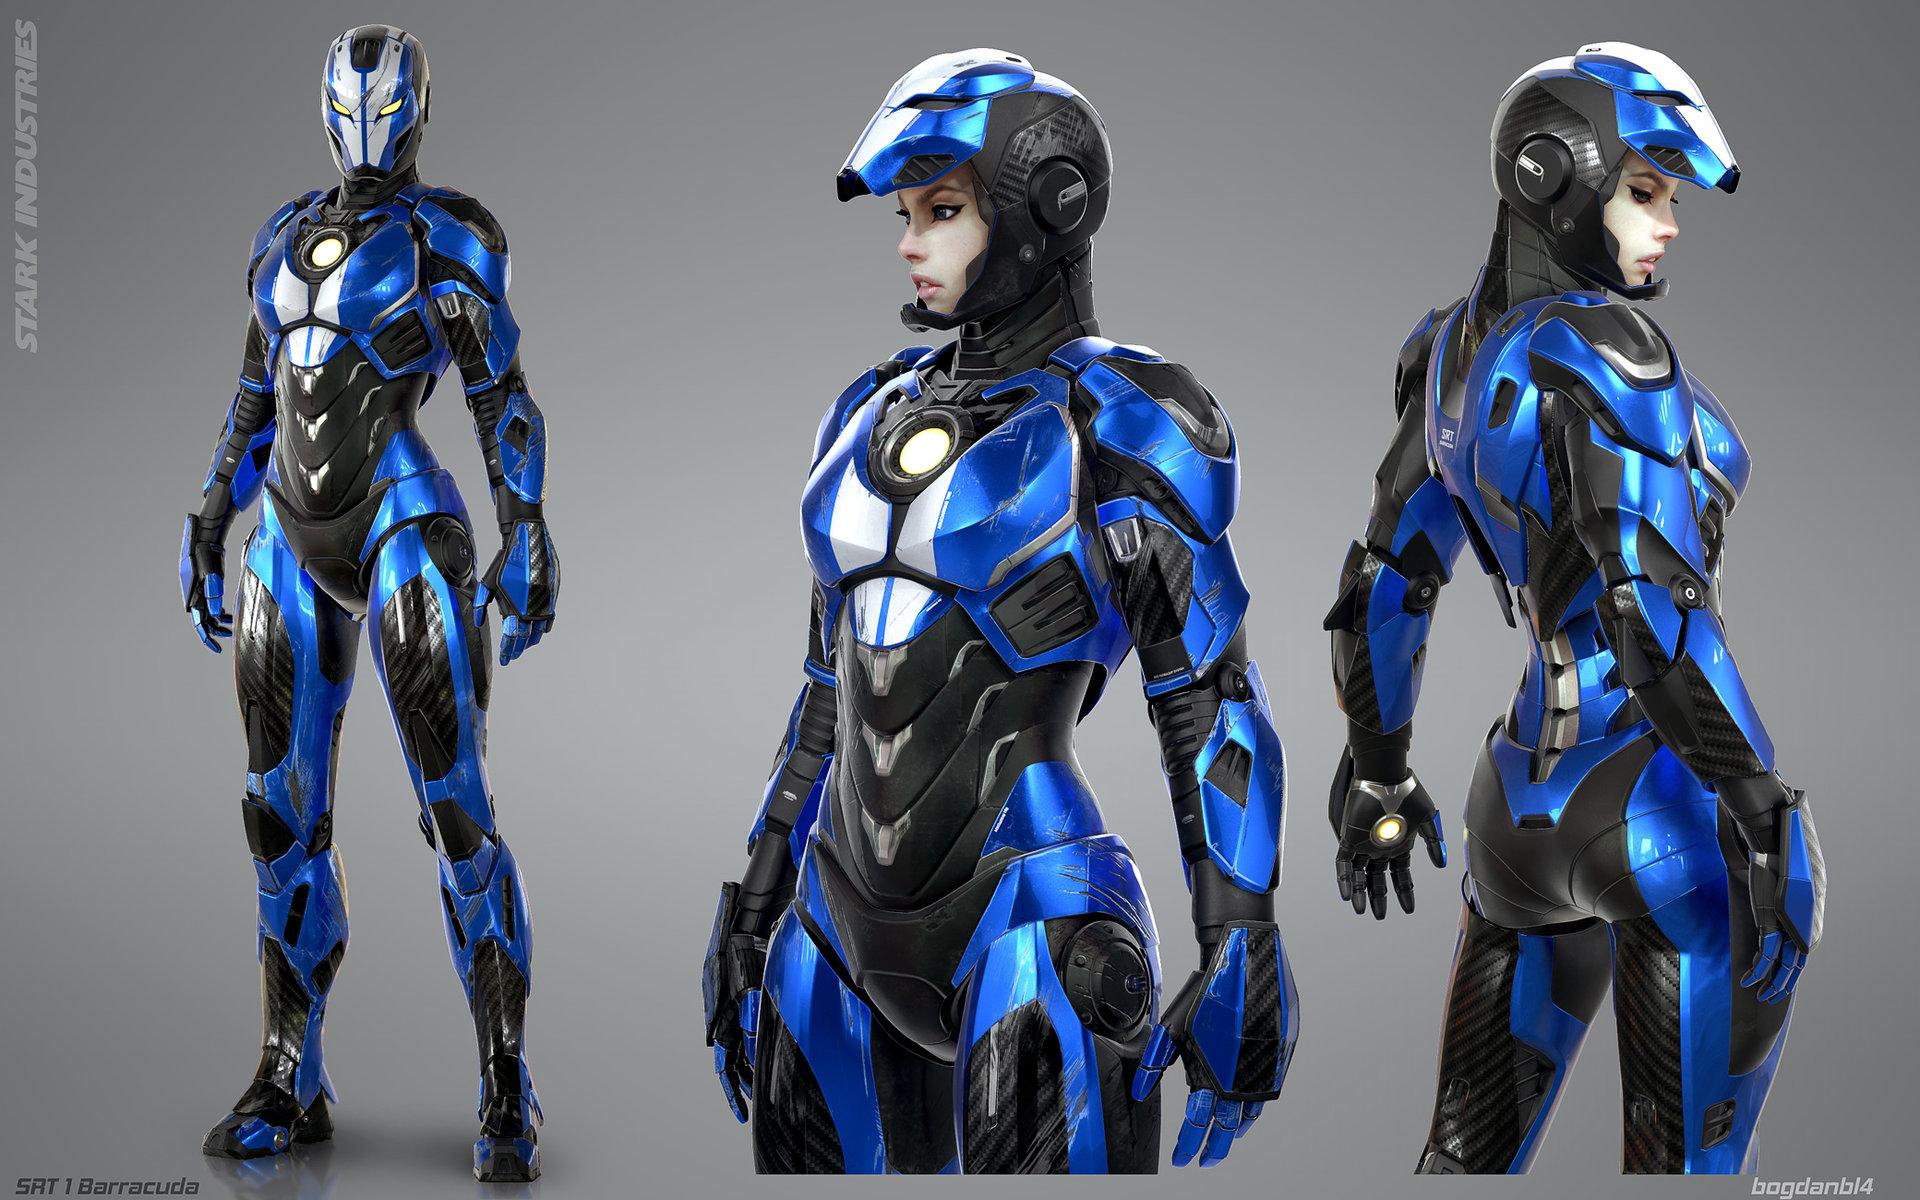 ironwoman | Explore ironwoman on DeviantArt